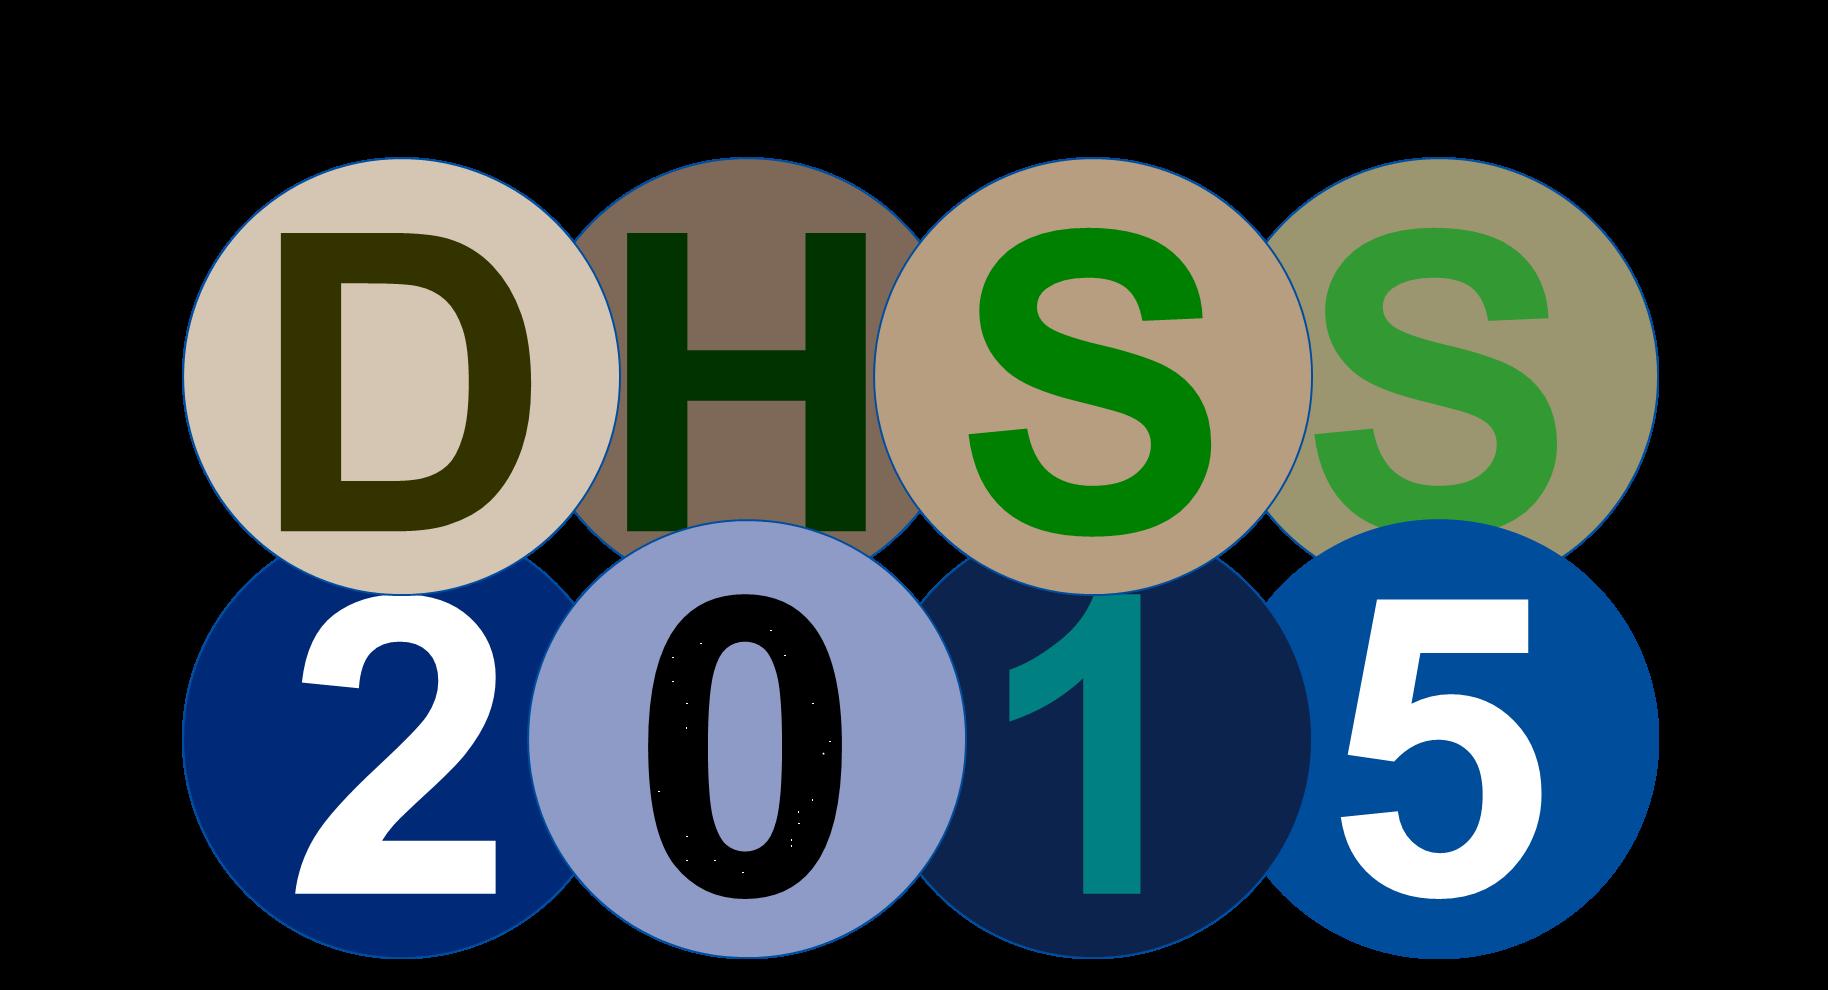 DHSS2015